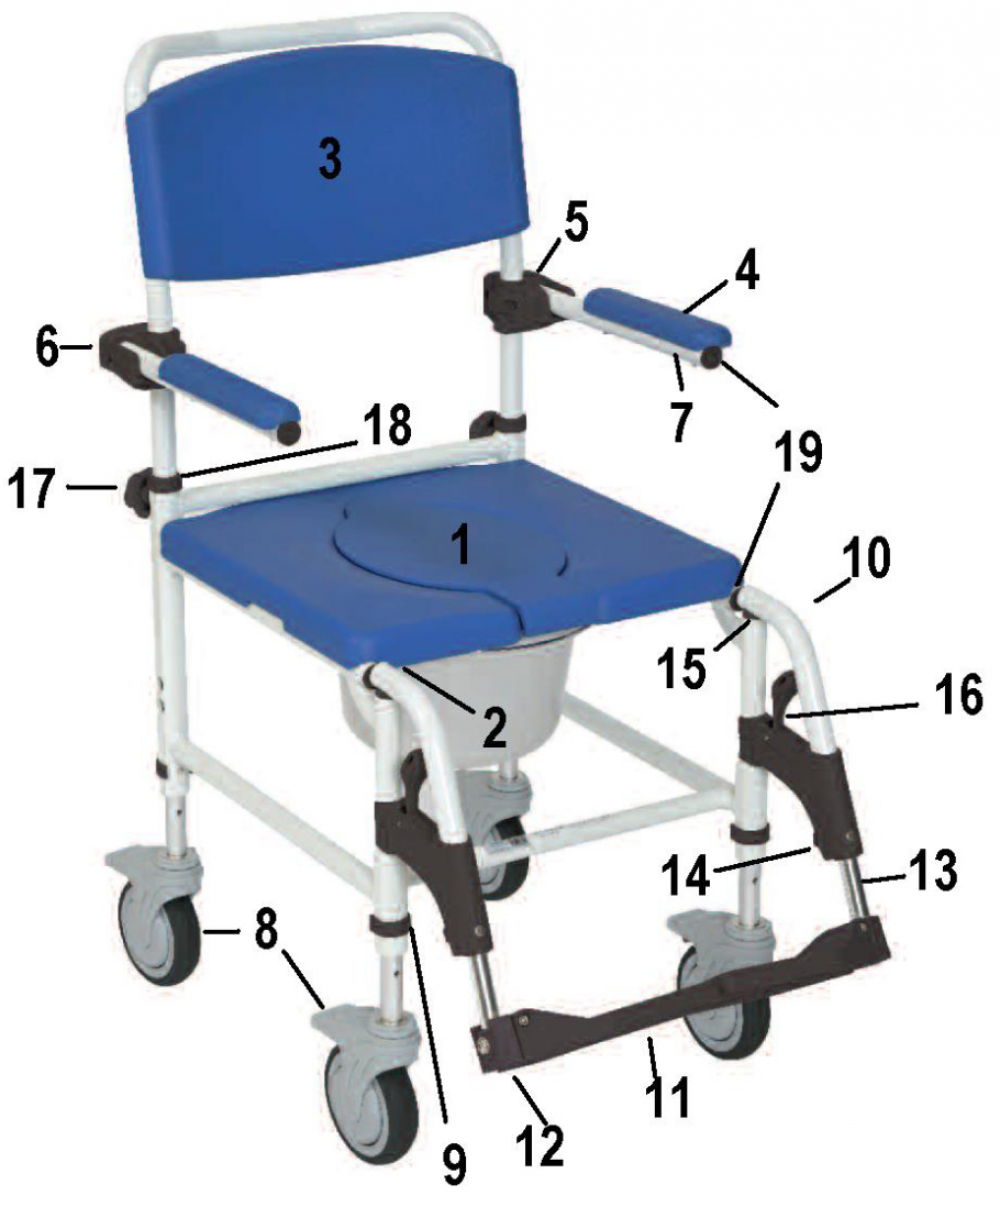 Parts For Nrs185007 parts diagram